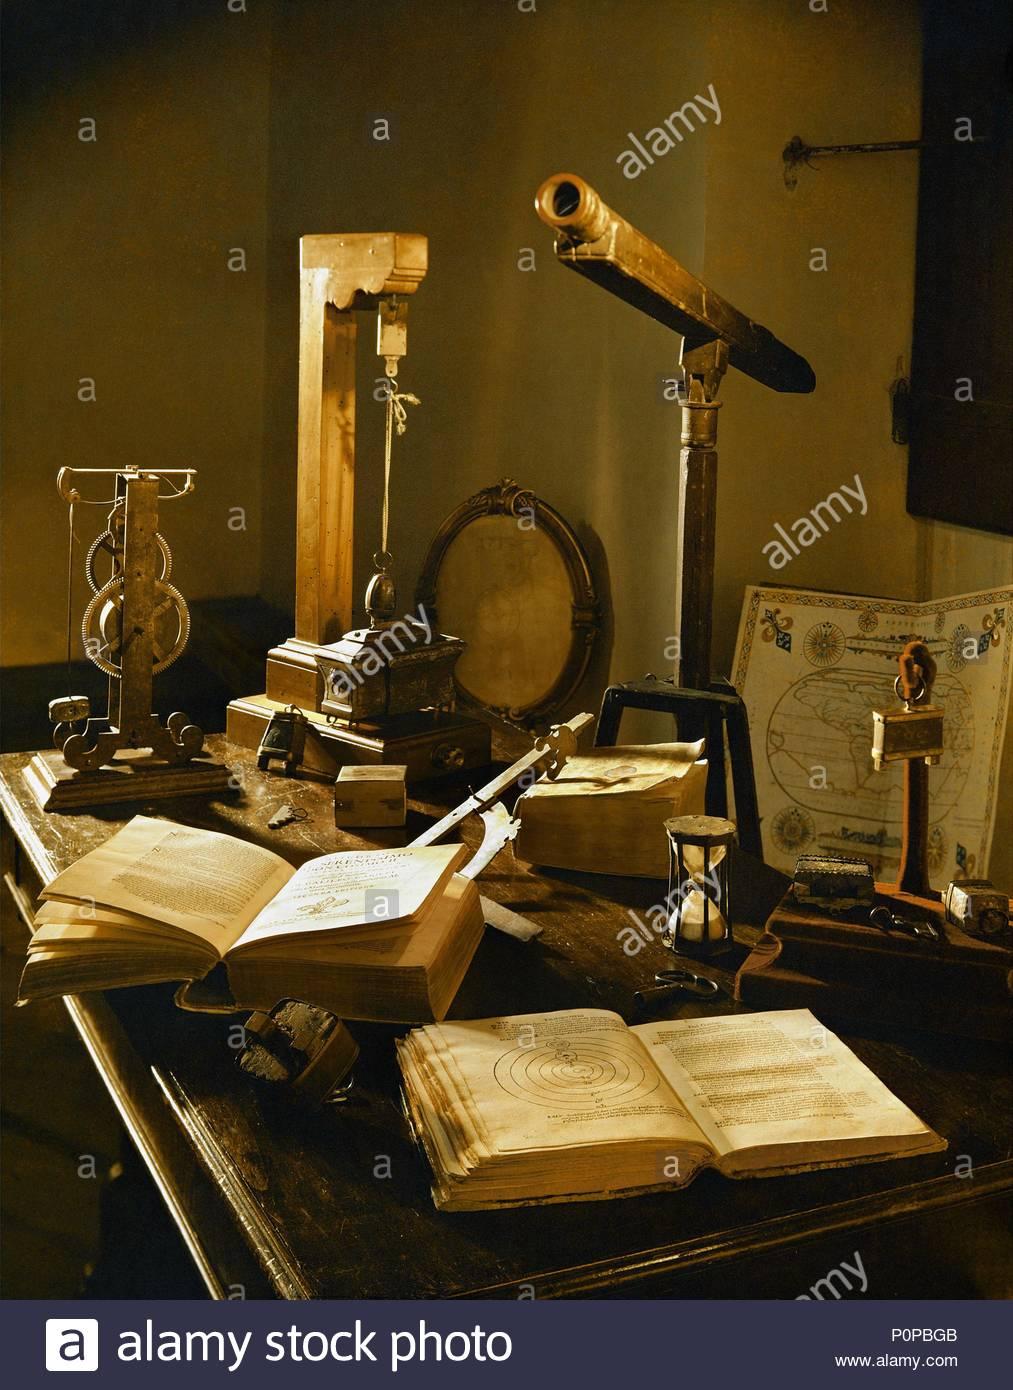 Galileo Galilei Compass